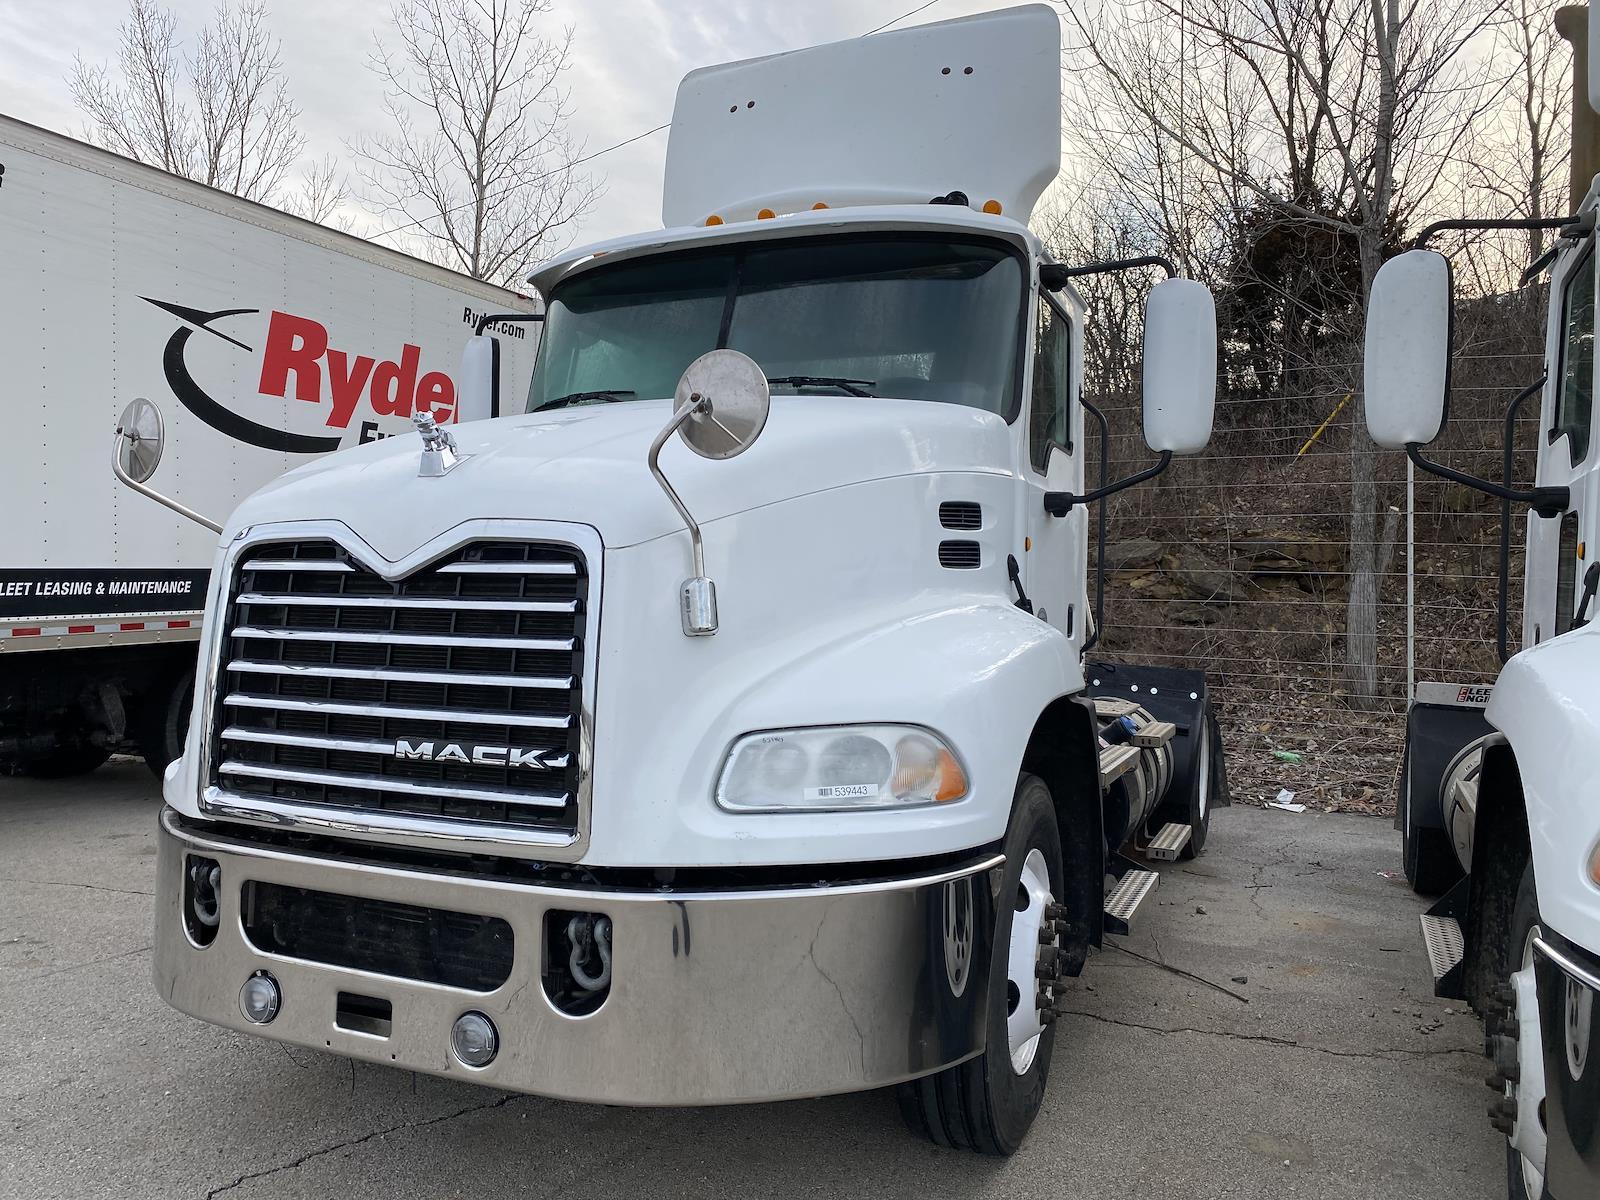 2014 Mack CXU612, Tractor #539443 - photo 1